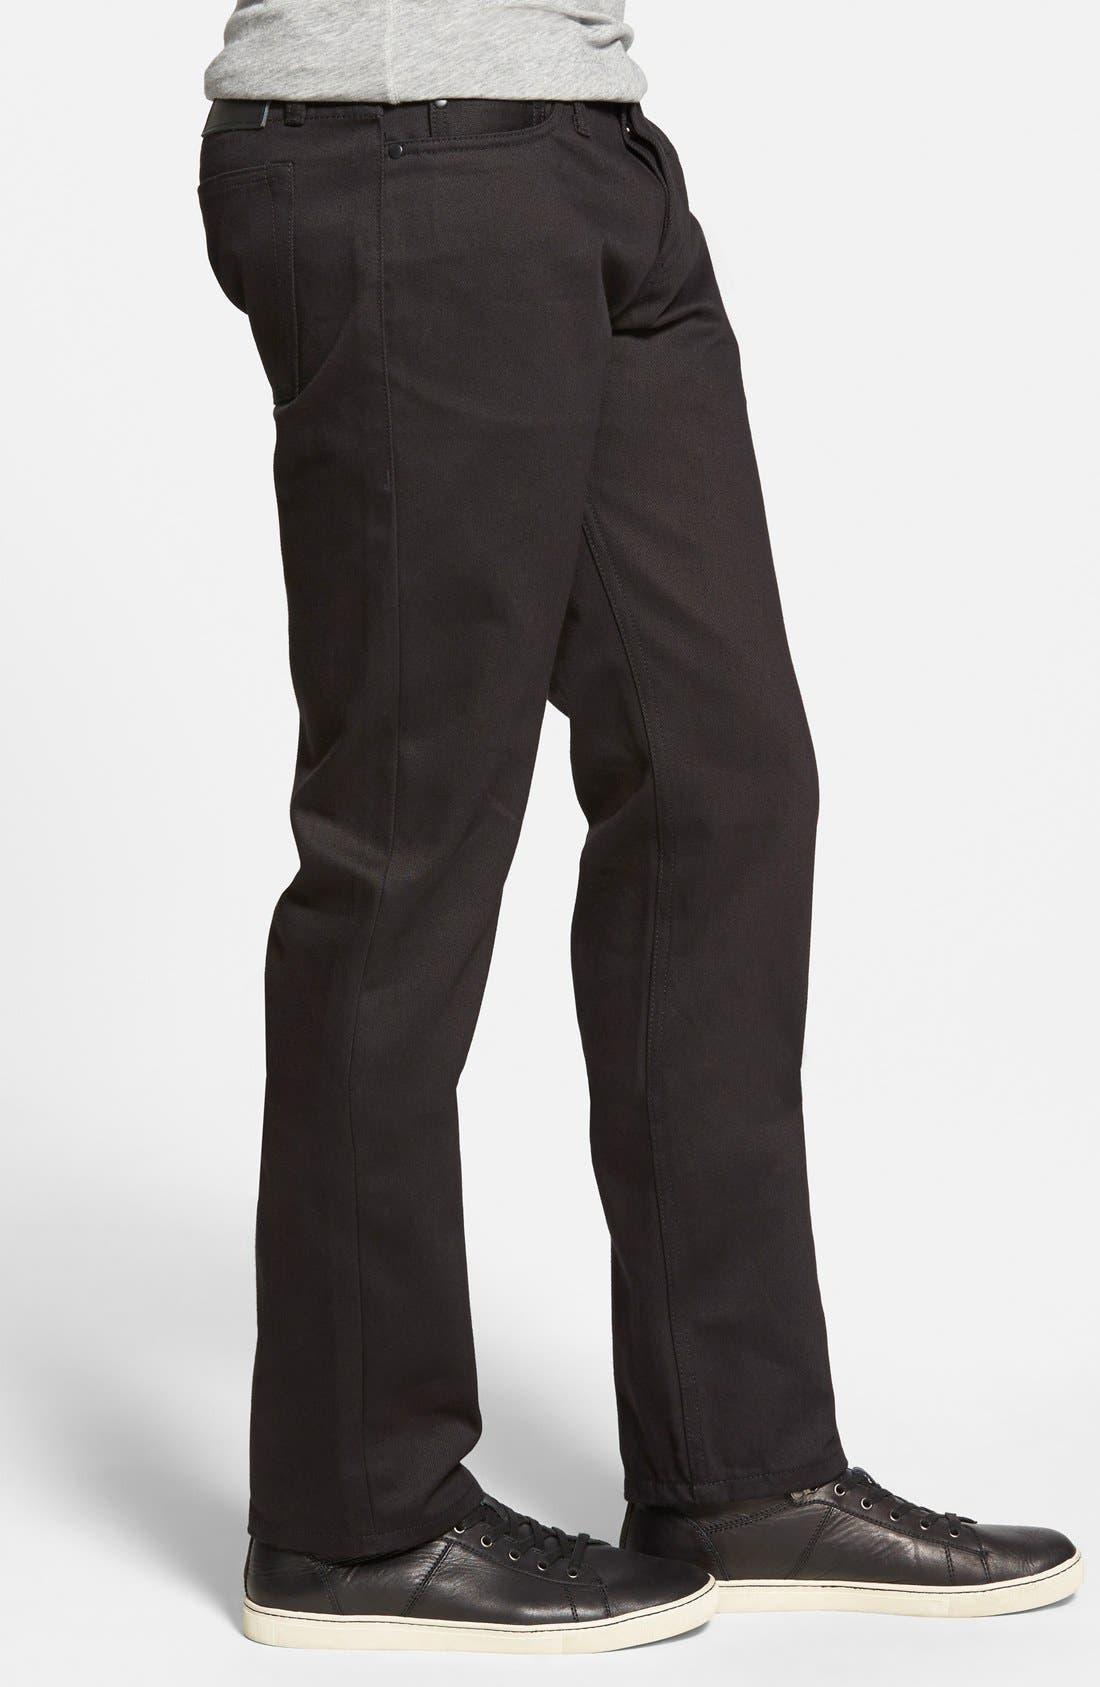 Alternate Image 3  - The Unbranded Brand 'UB255' Slim Tapered Fit Raw Selvedge Jeans (Black Selvedge)